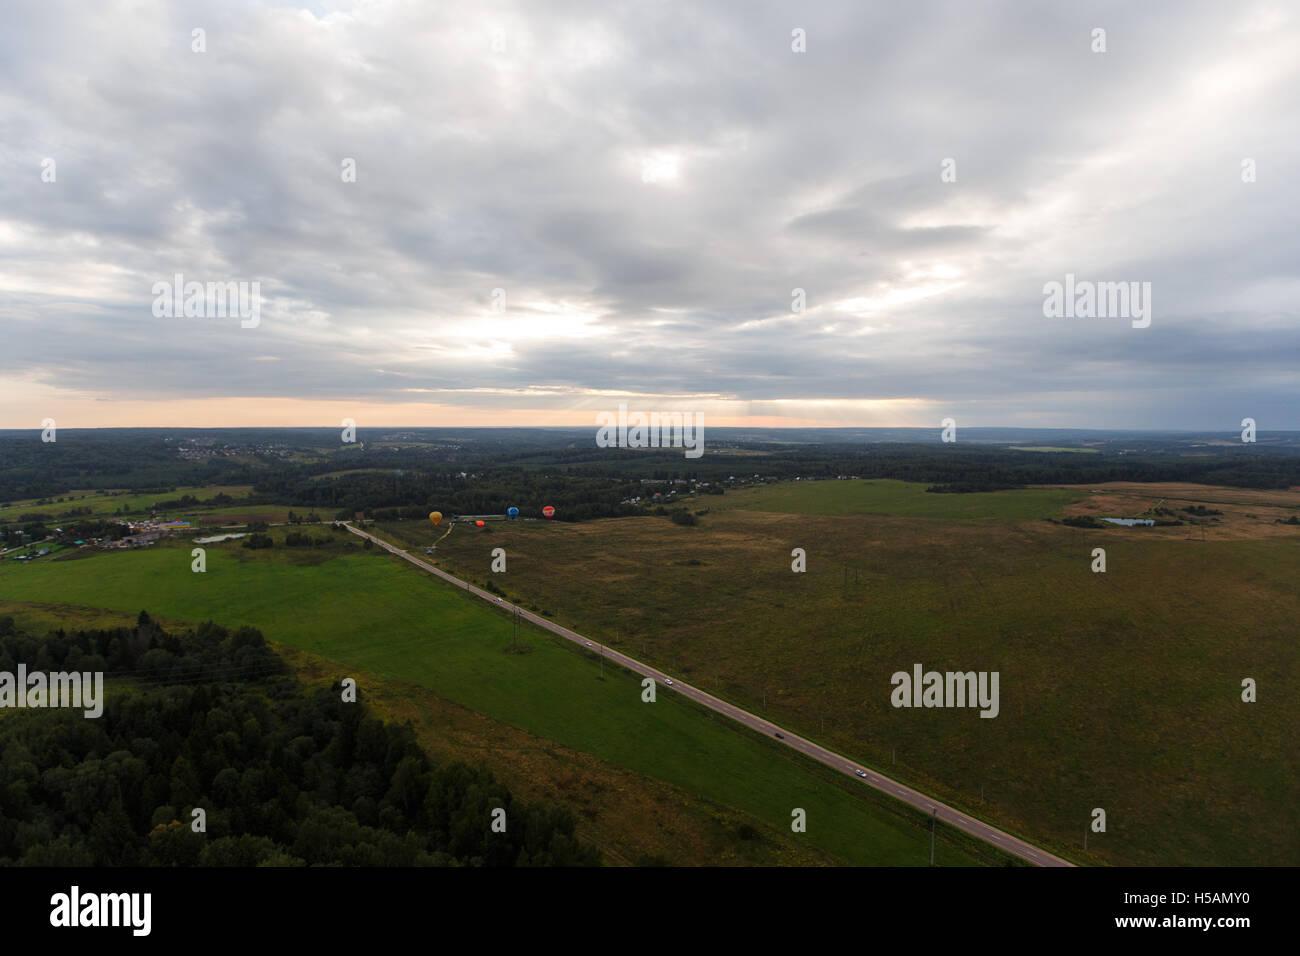 Bird's eye view of farm lands - Stock Image